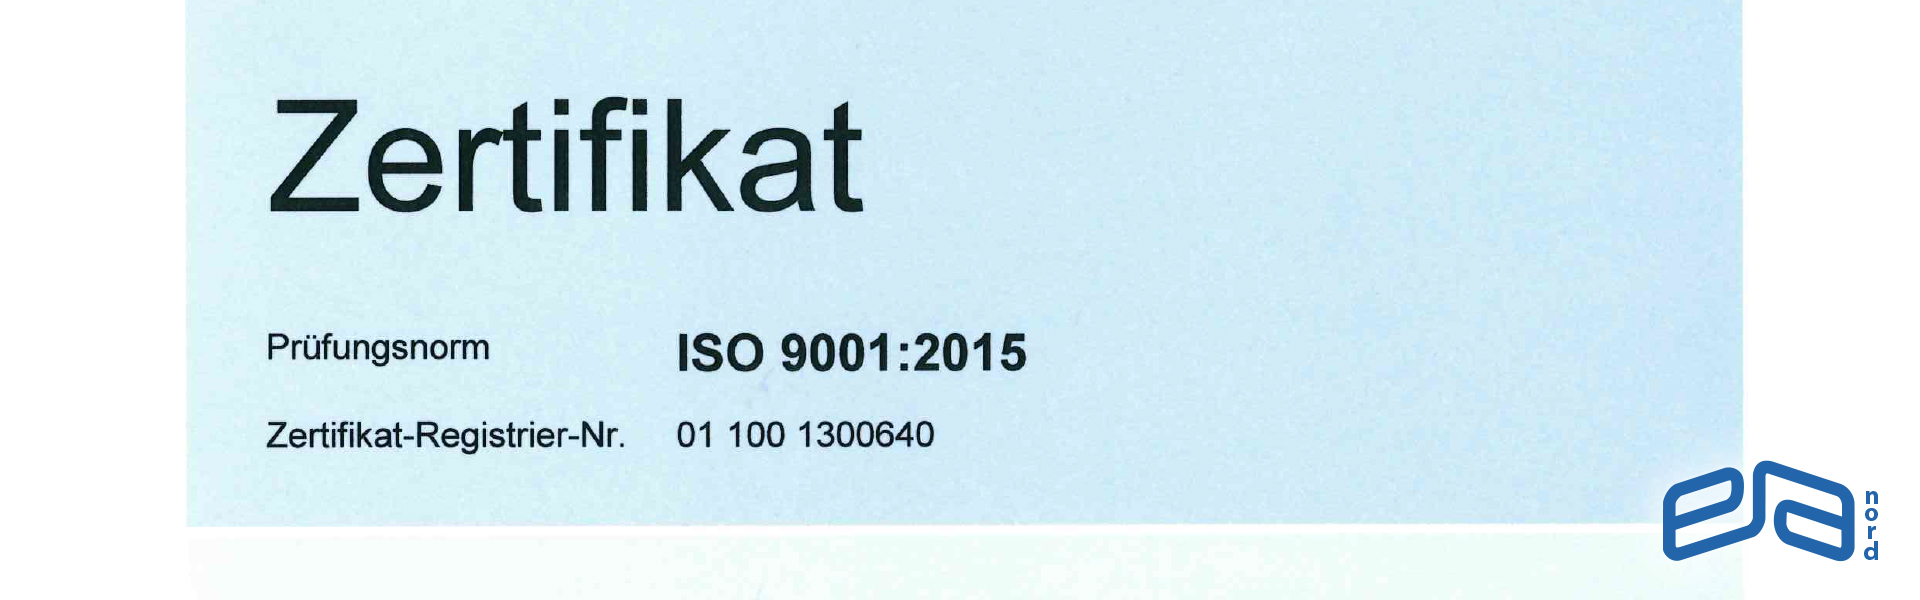 ea-nord-zertifikate-01